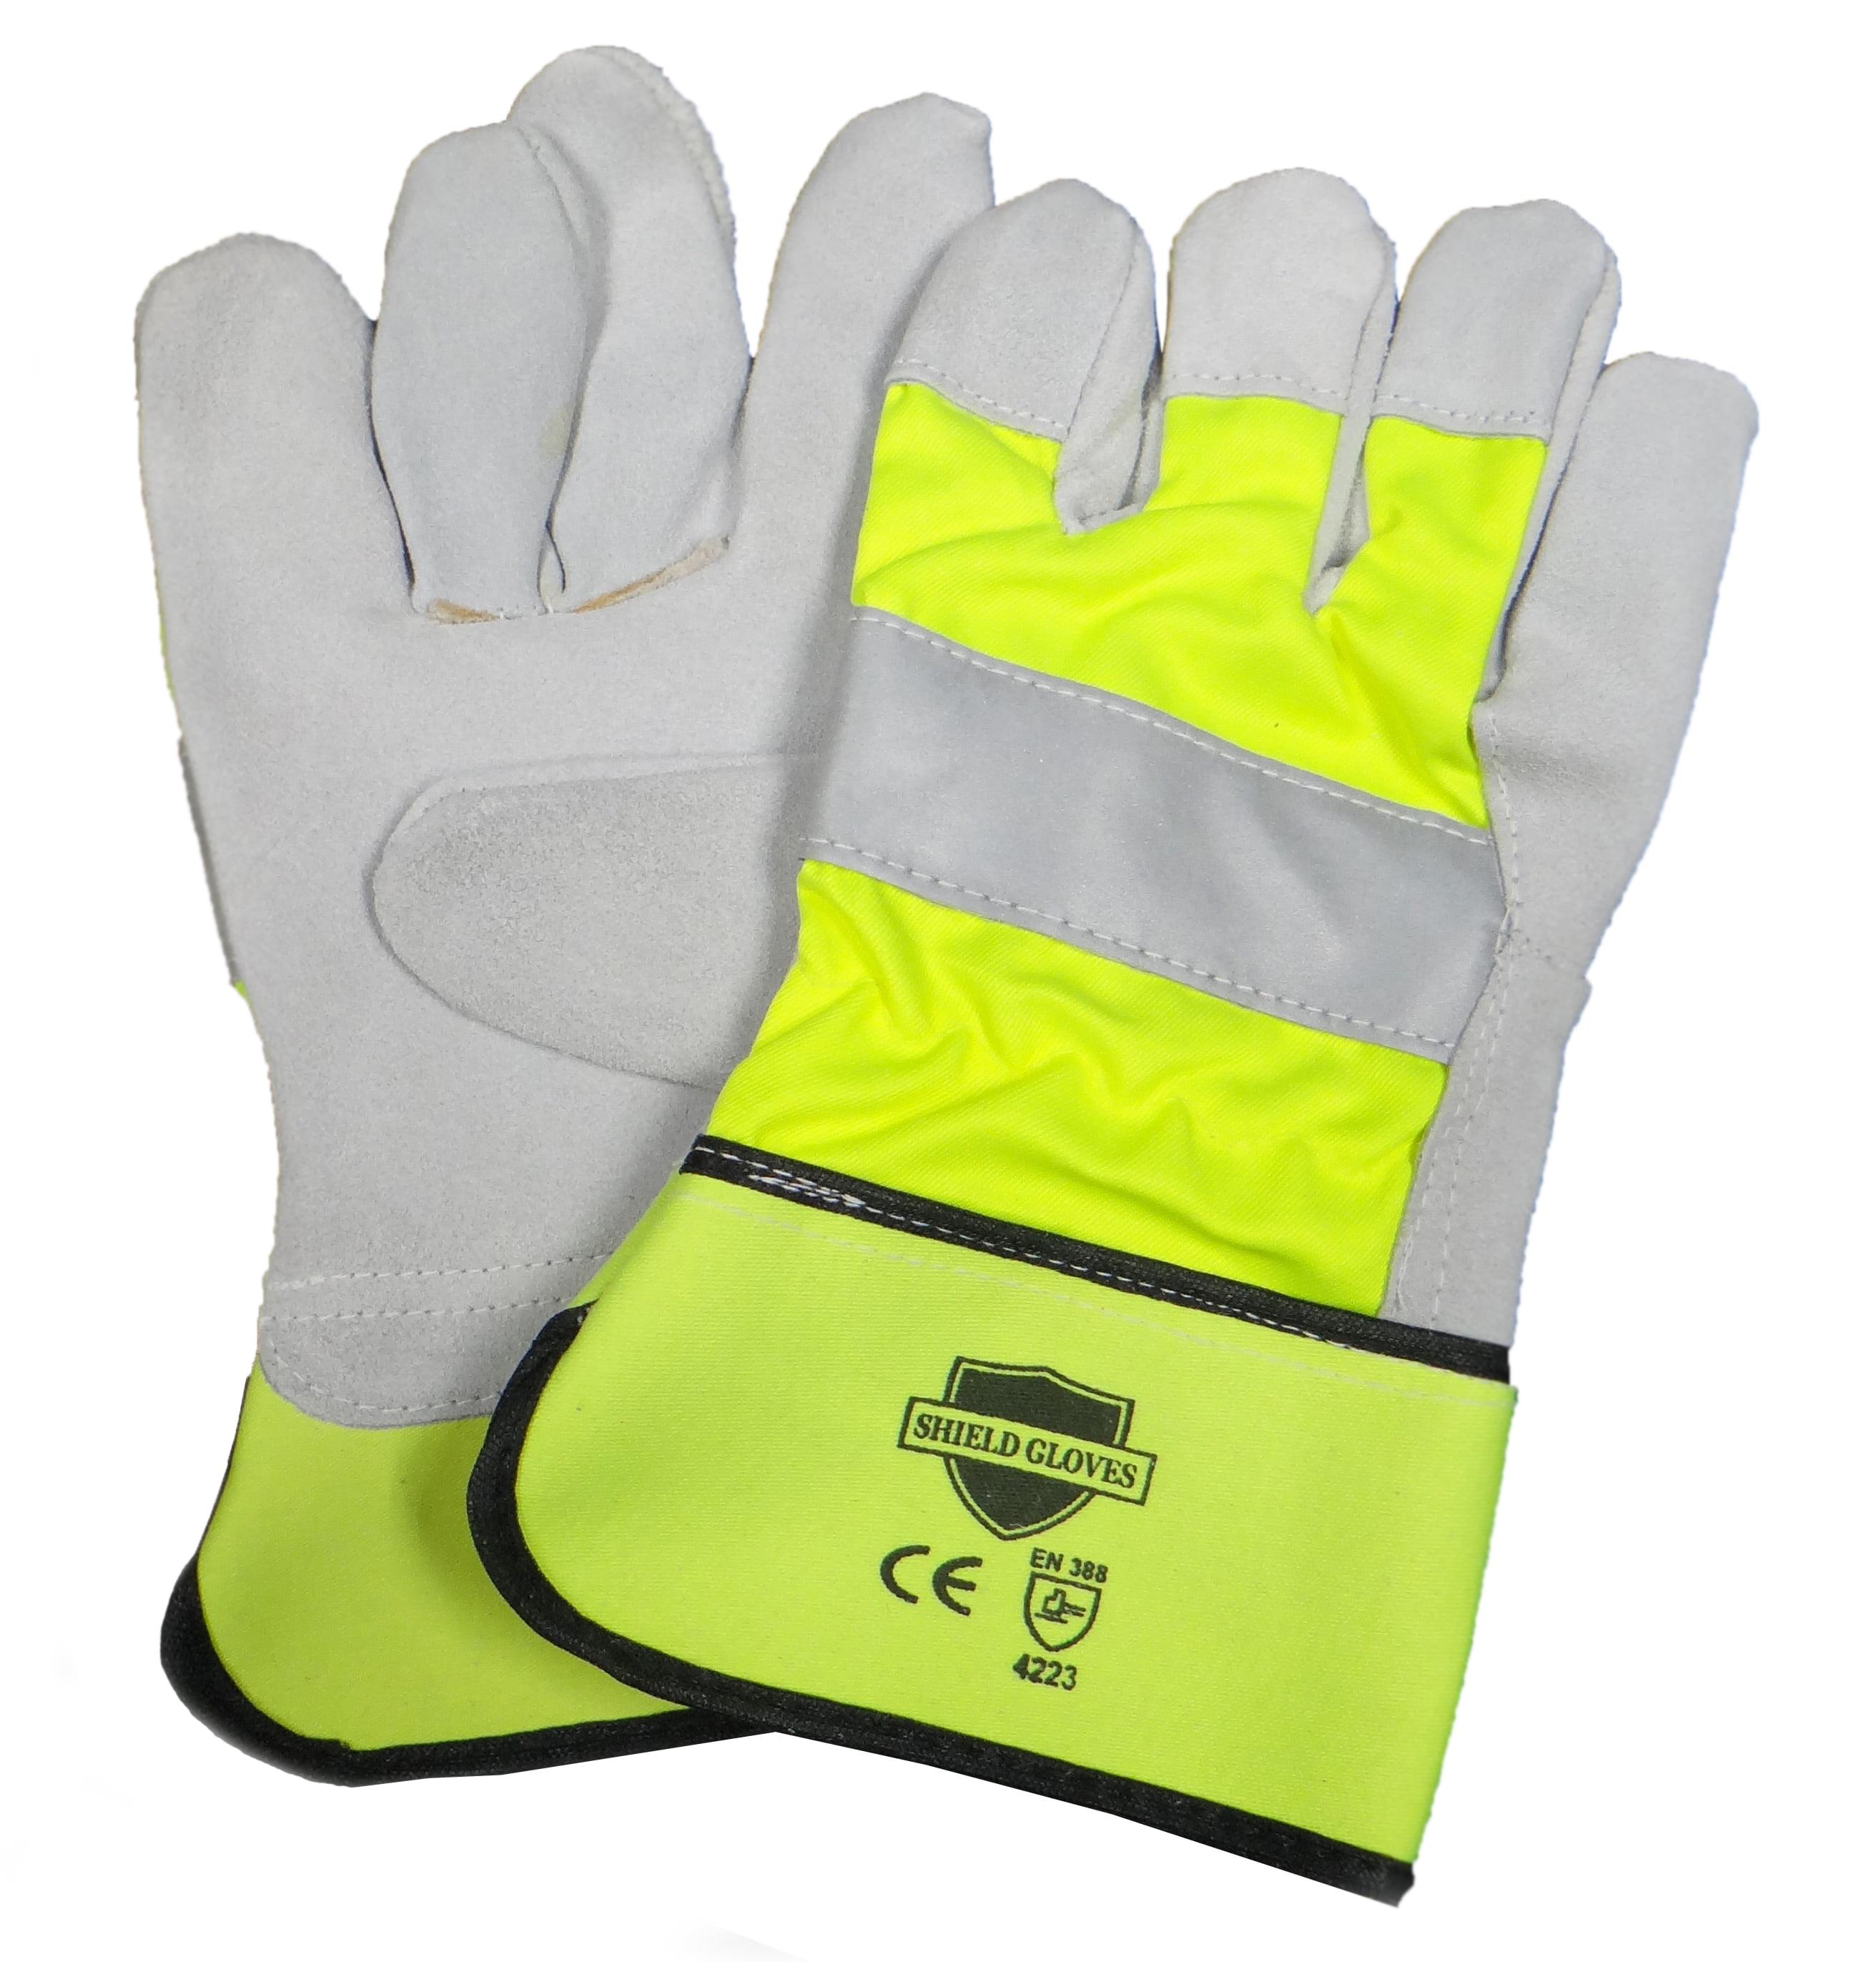 Leather Work Industrial Gloves Hi-Vis Heavy Duty Non ...  Pair